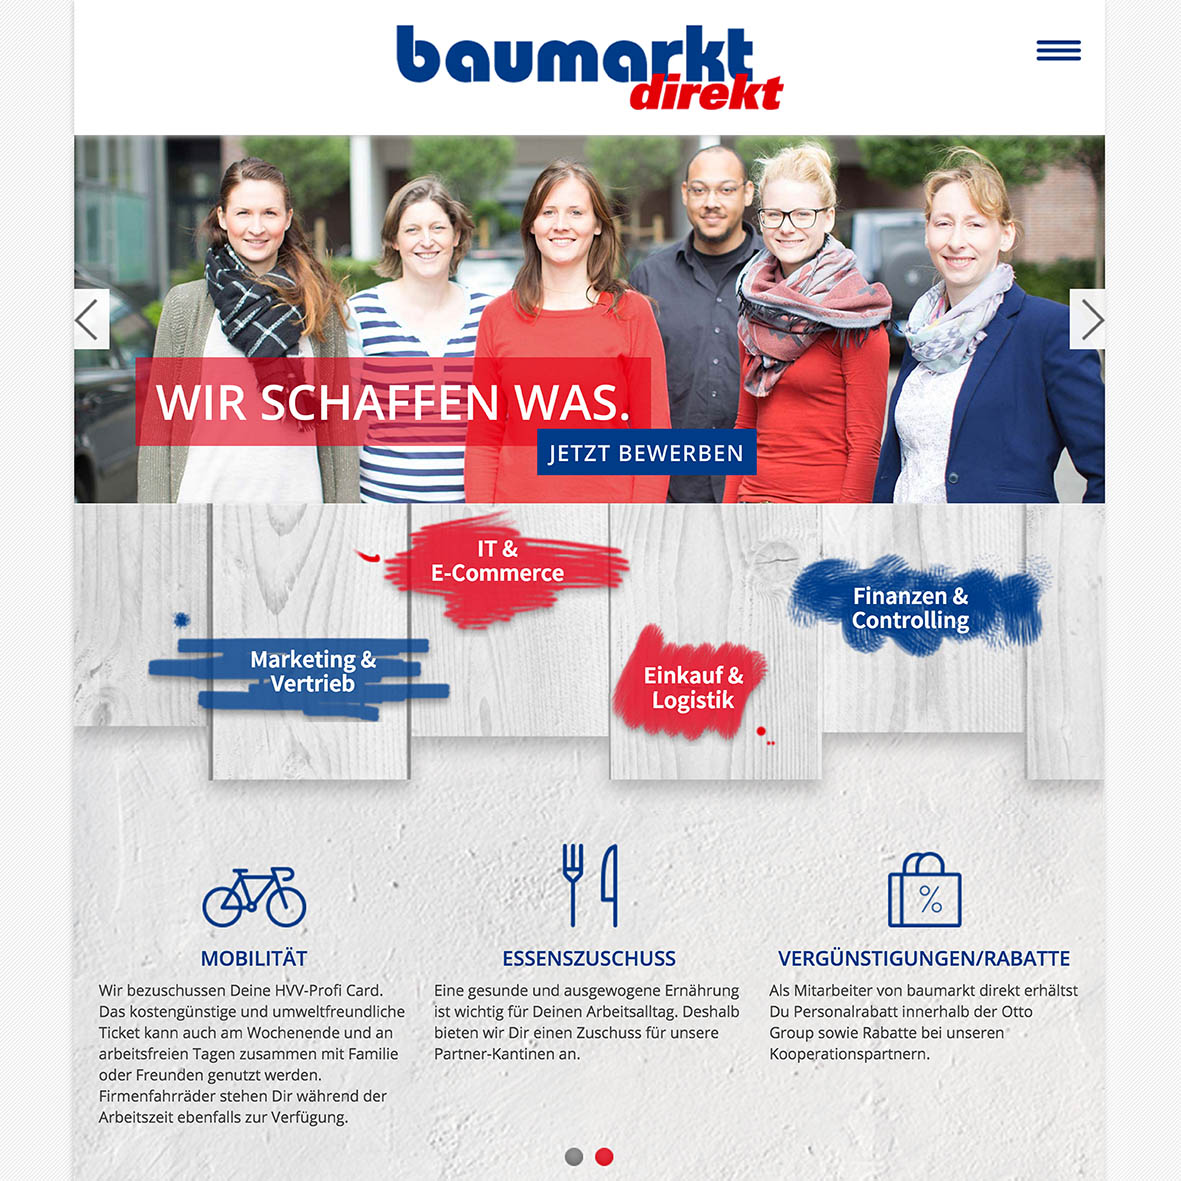 baumarkt direkt launcht karriere website. Black Bedroom Furniture Sets. Home Design Ideas